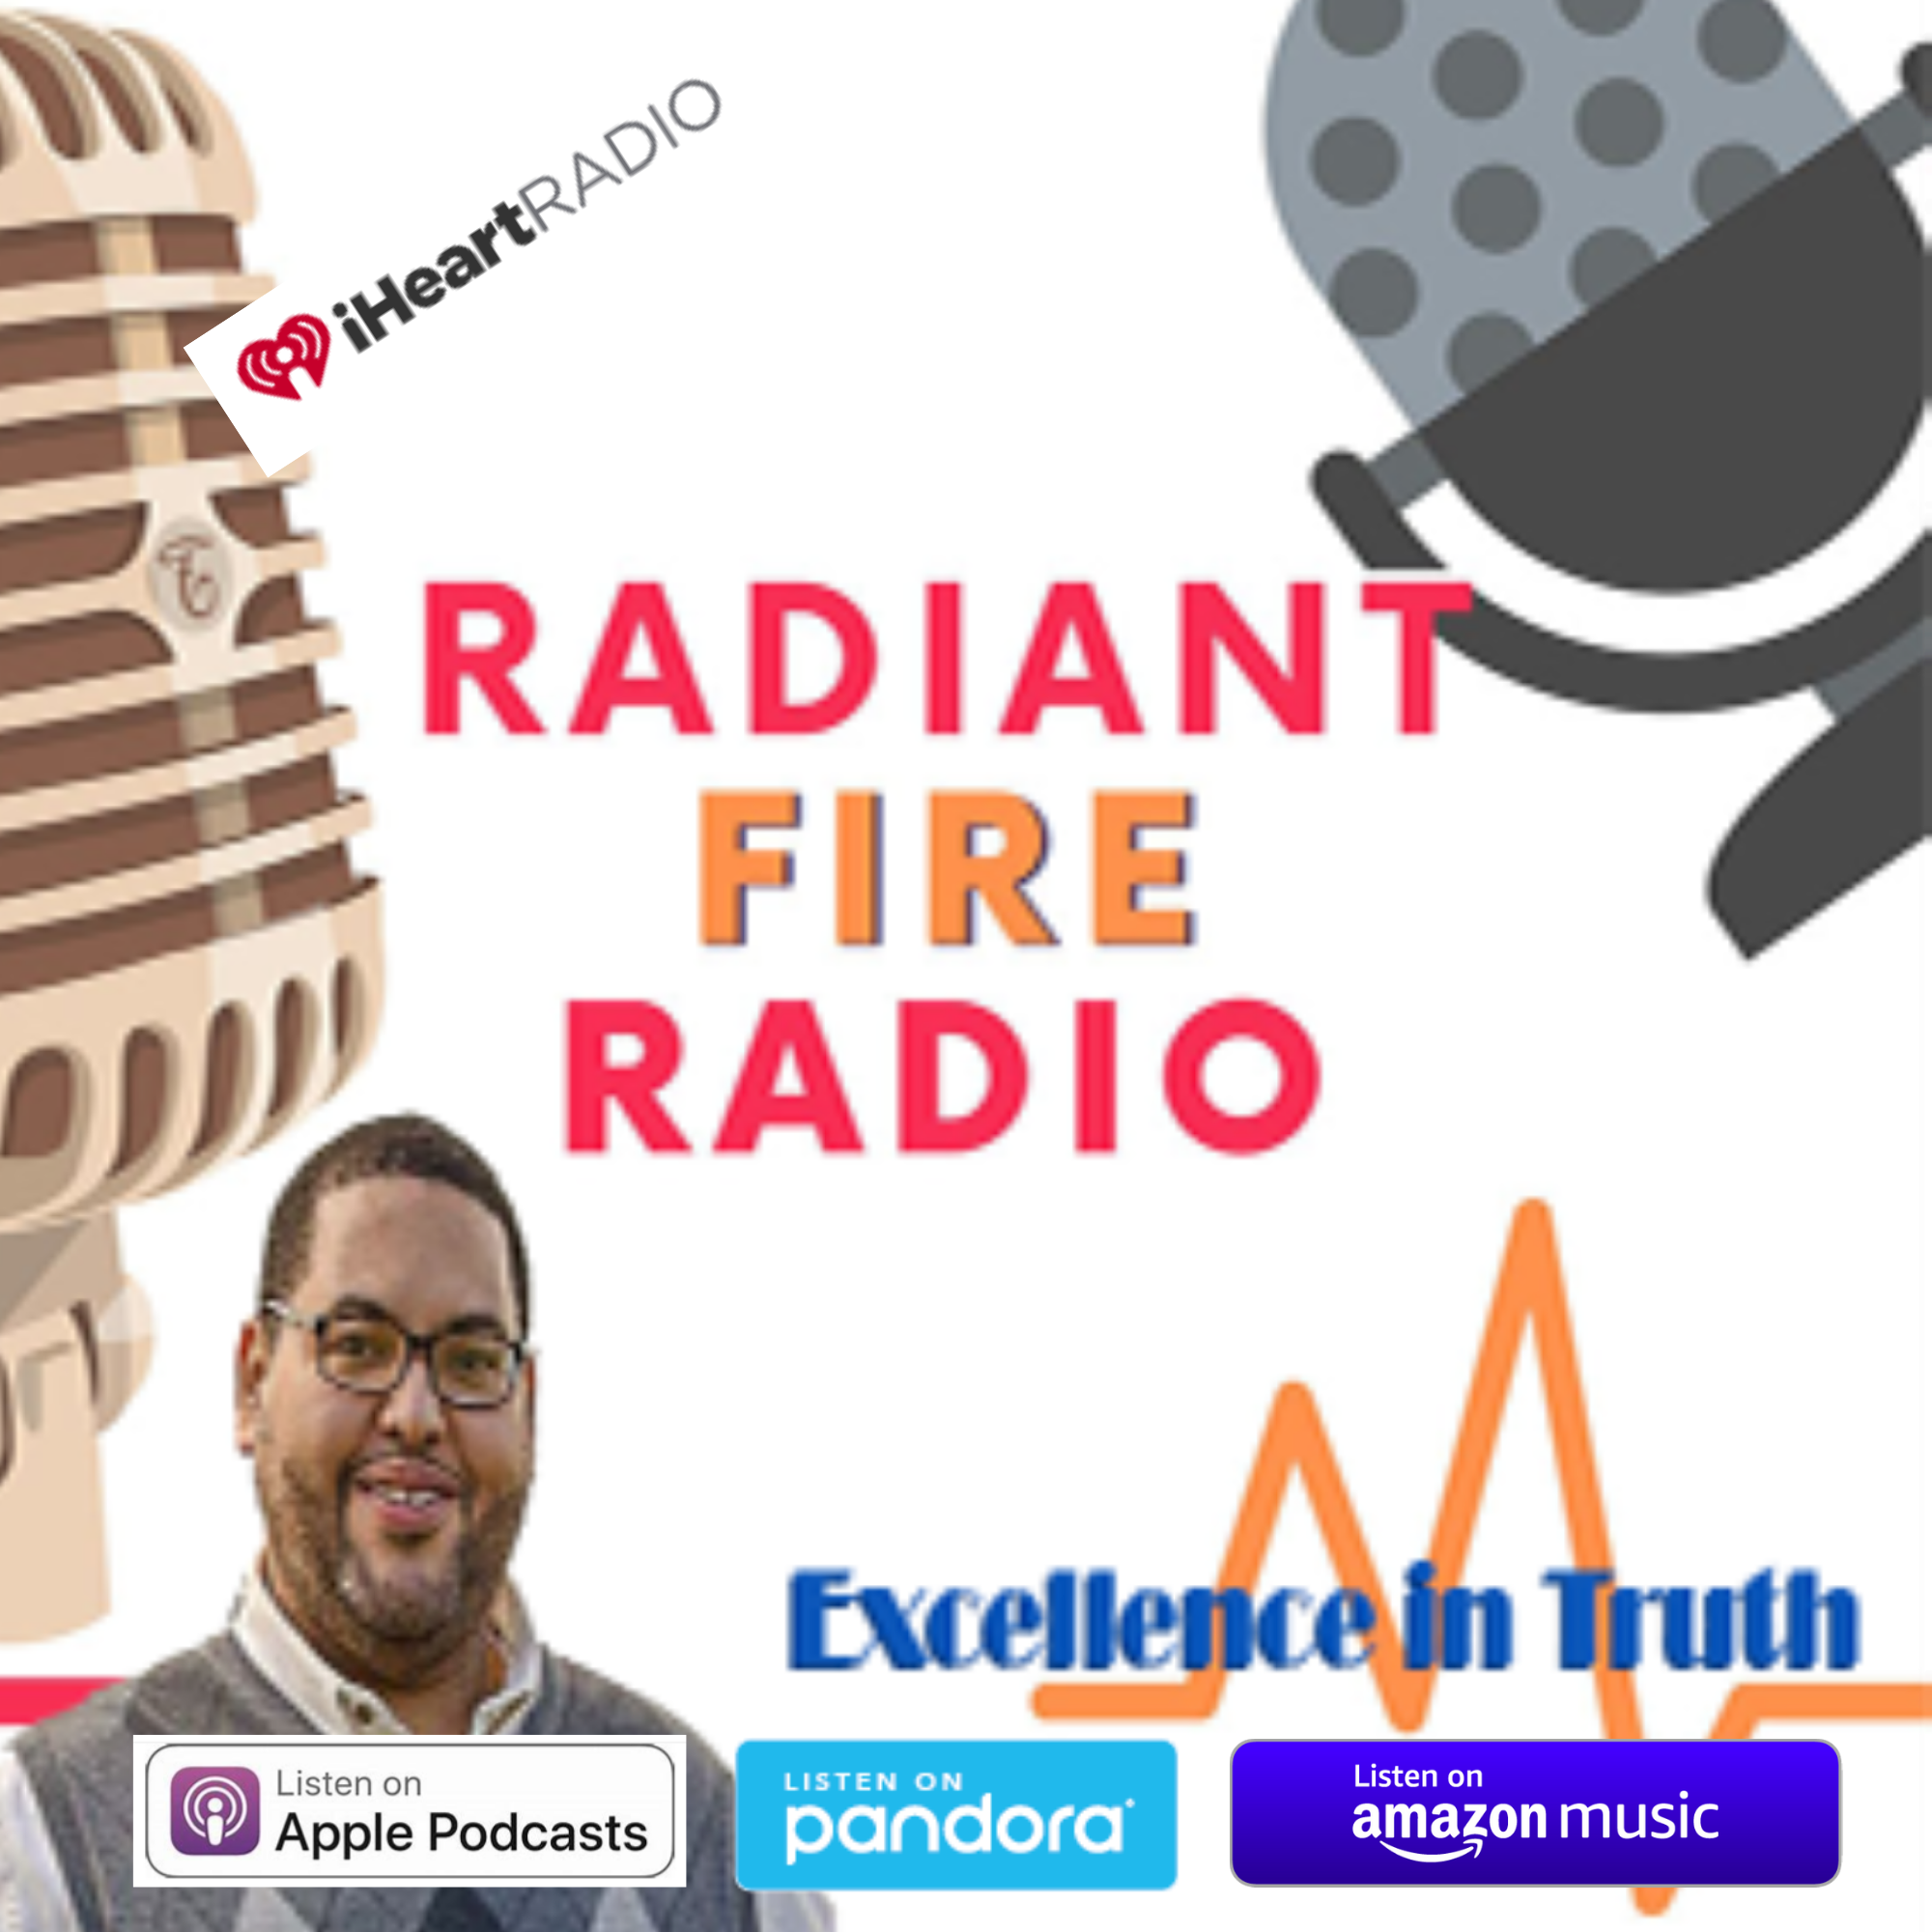 Radiant Fire Radio show art